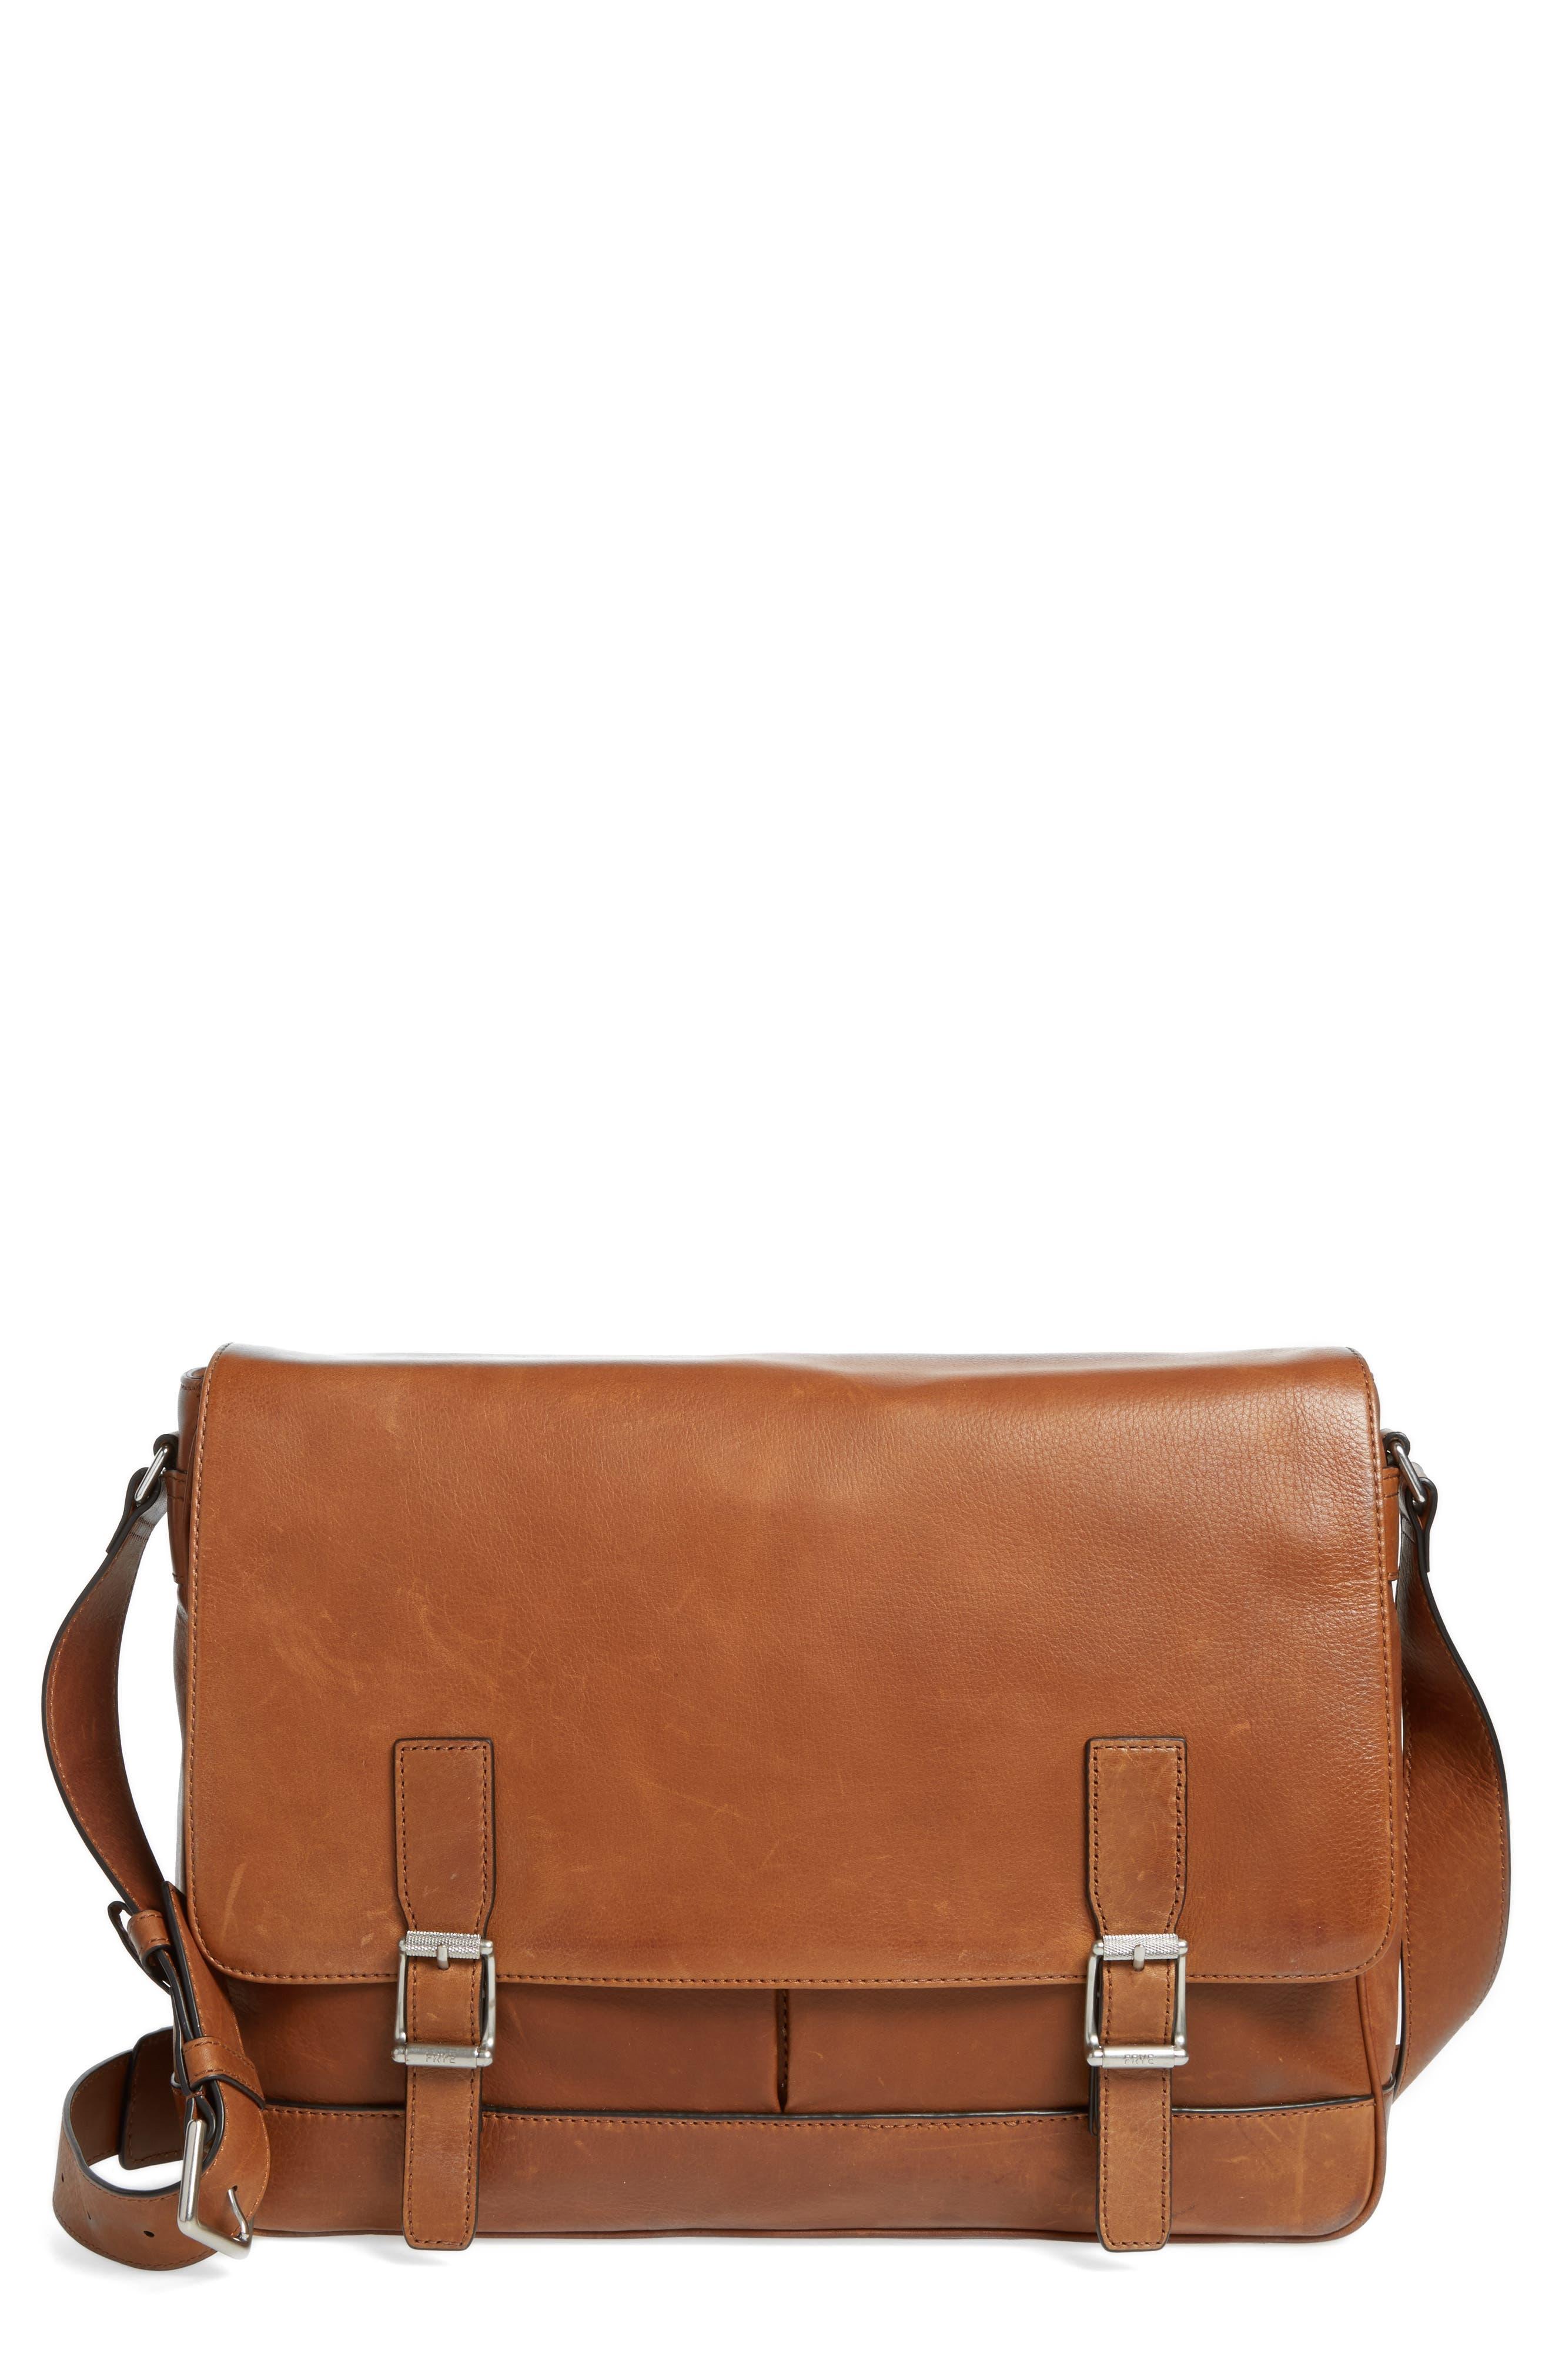 Oliver Leather Messenger Bag,                             Main thumbnail 1, color,                             Cognac